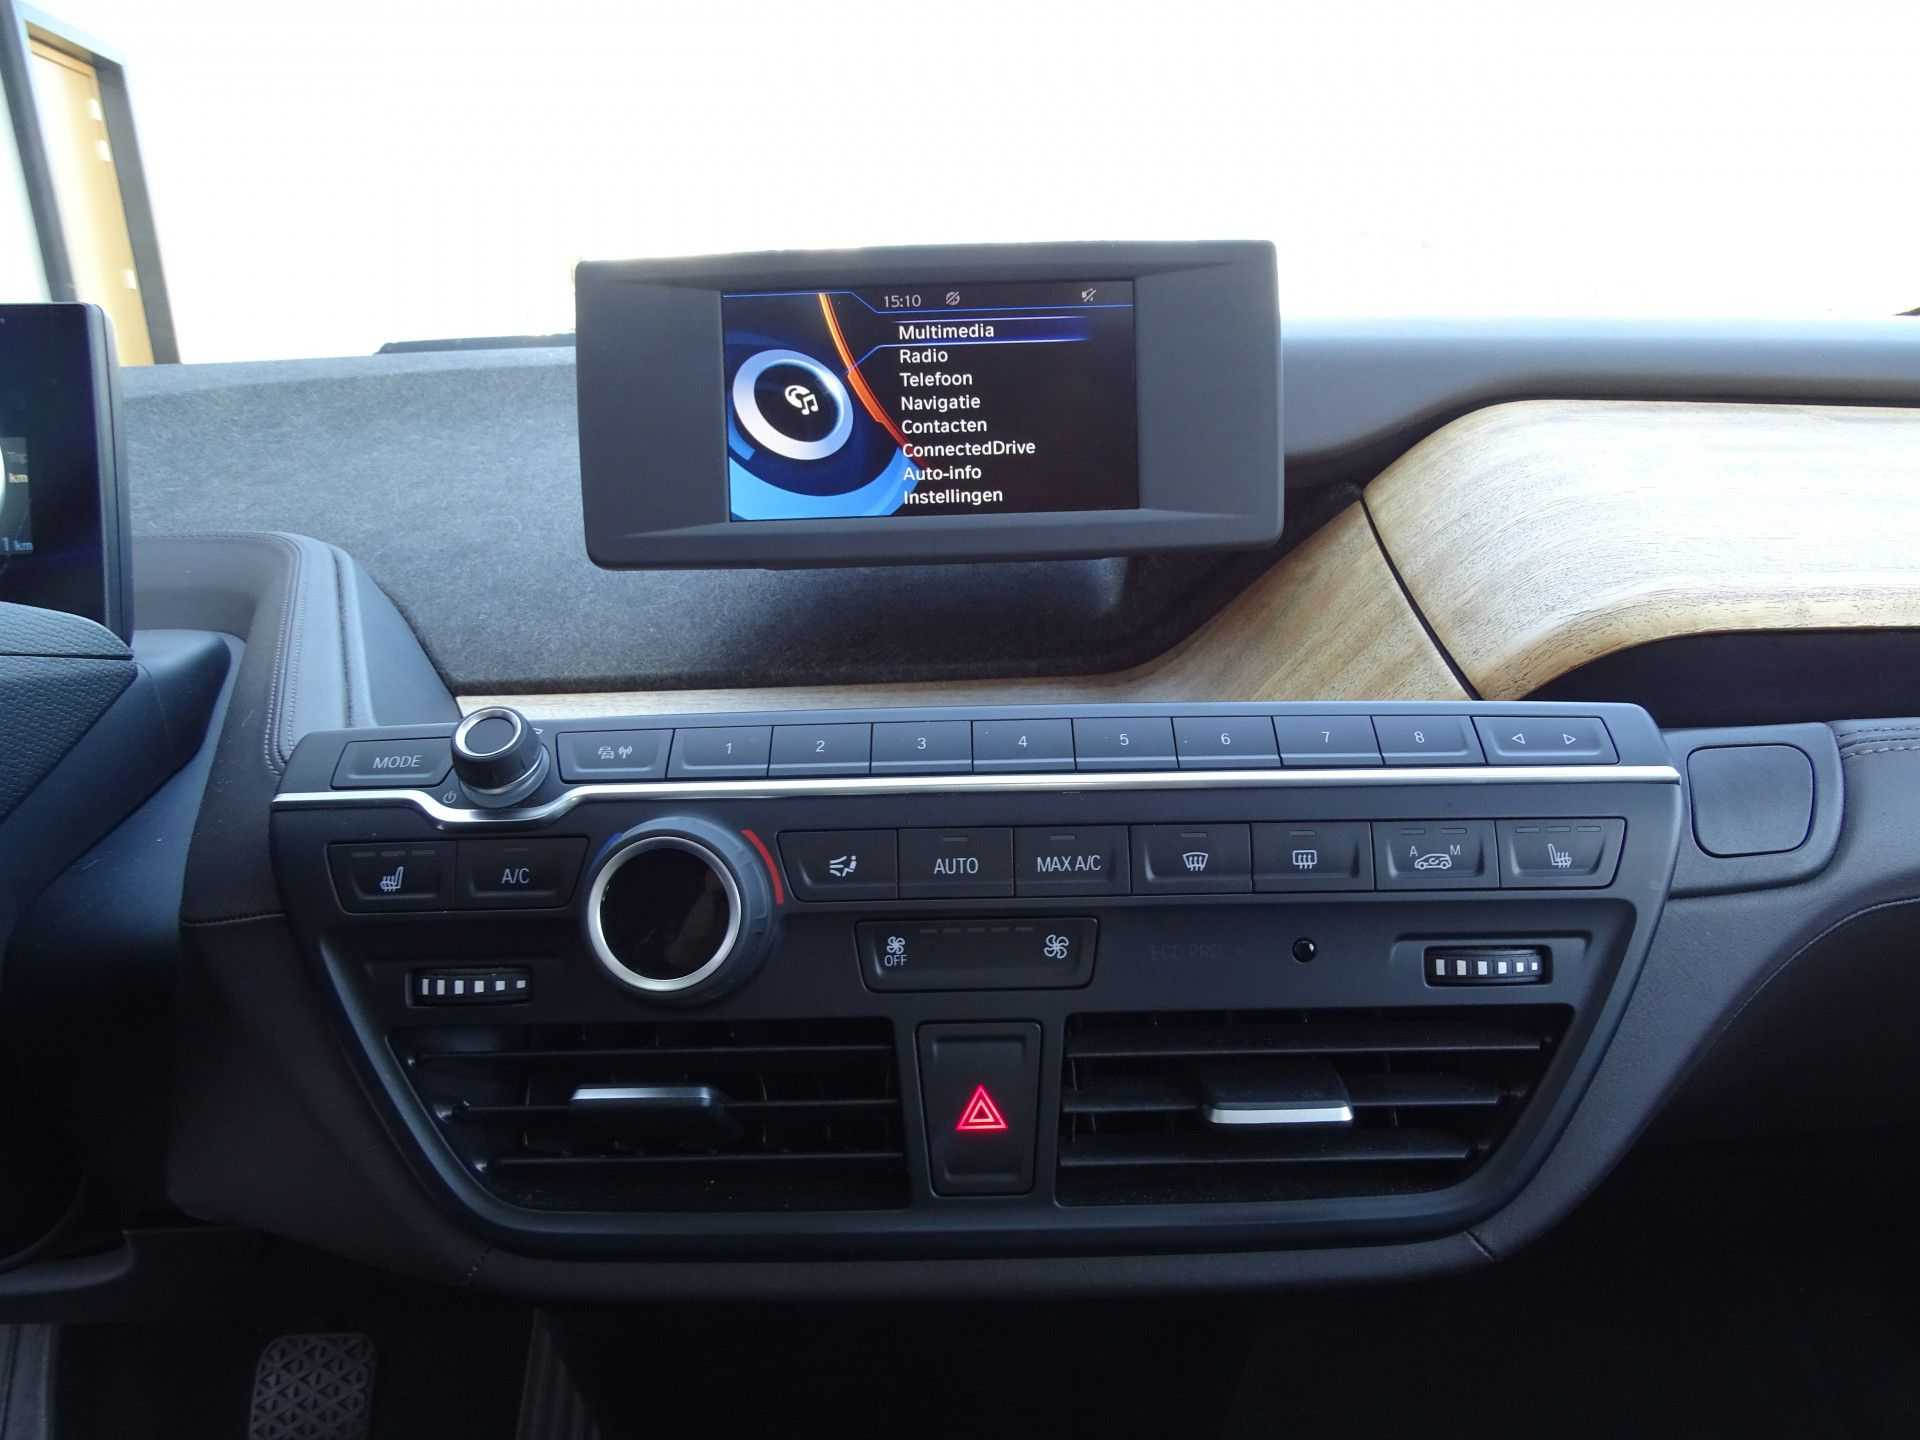 BMW i3 Basis Comfort Advance 22 kWh Marge Warmtepomp Navigatie Clima Cruise Panorama afbeelding 15